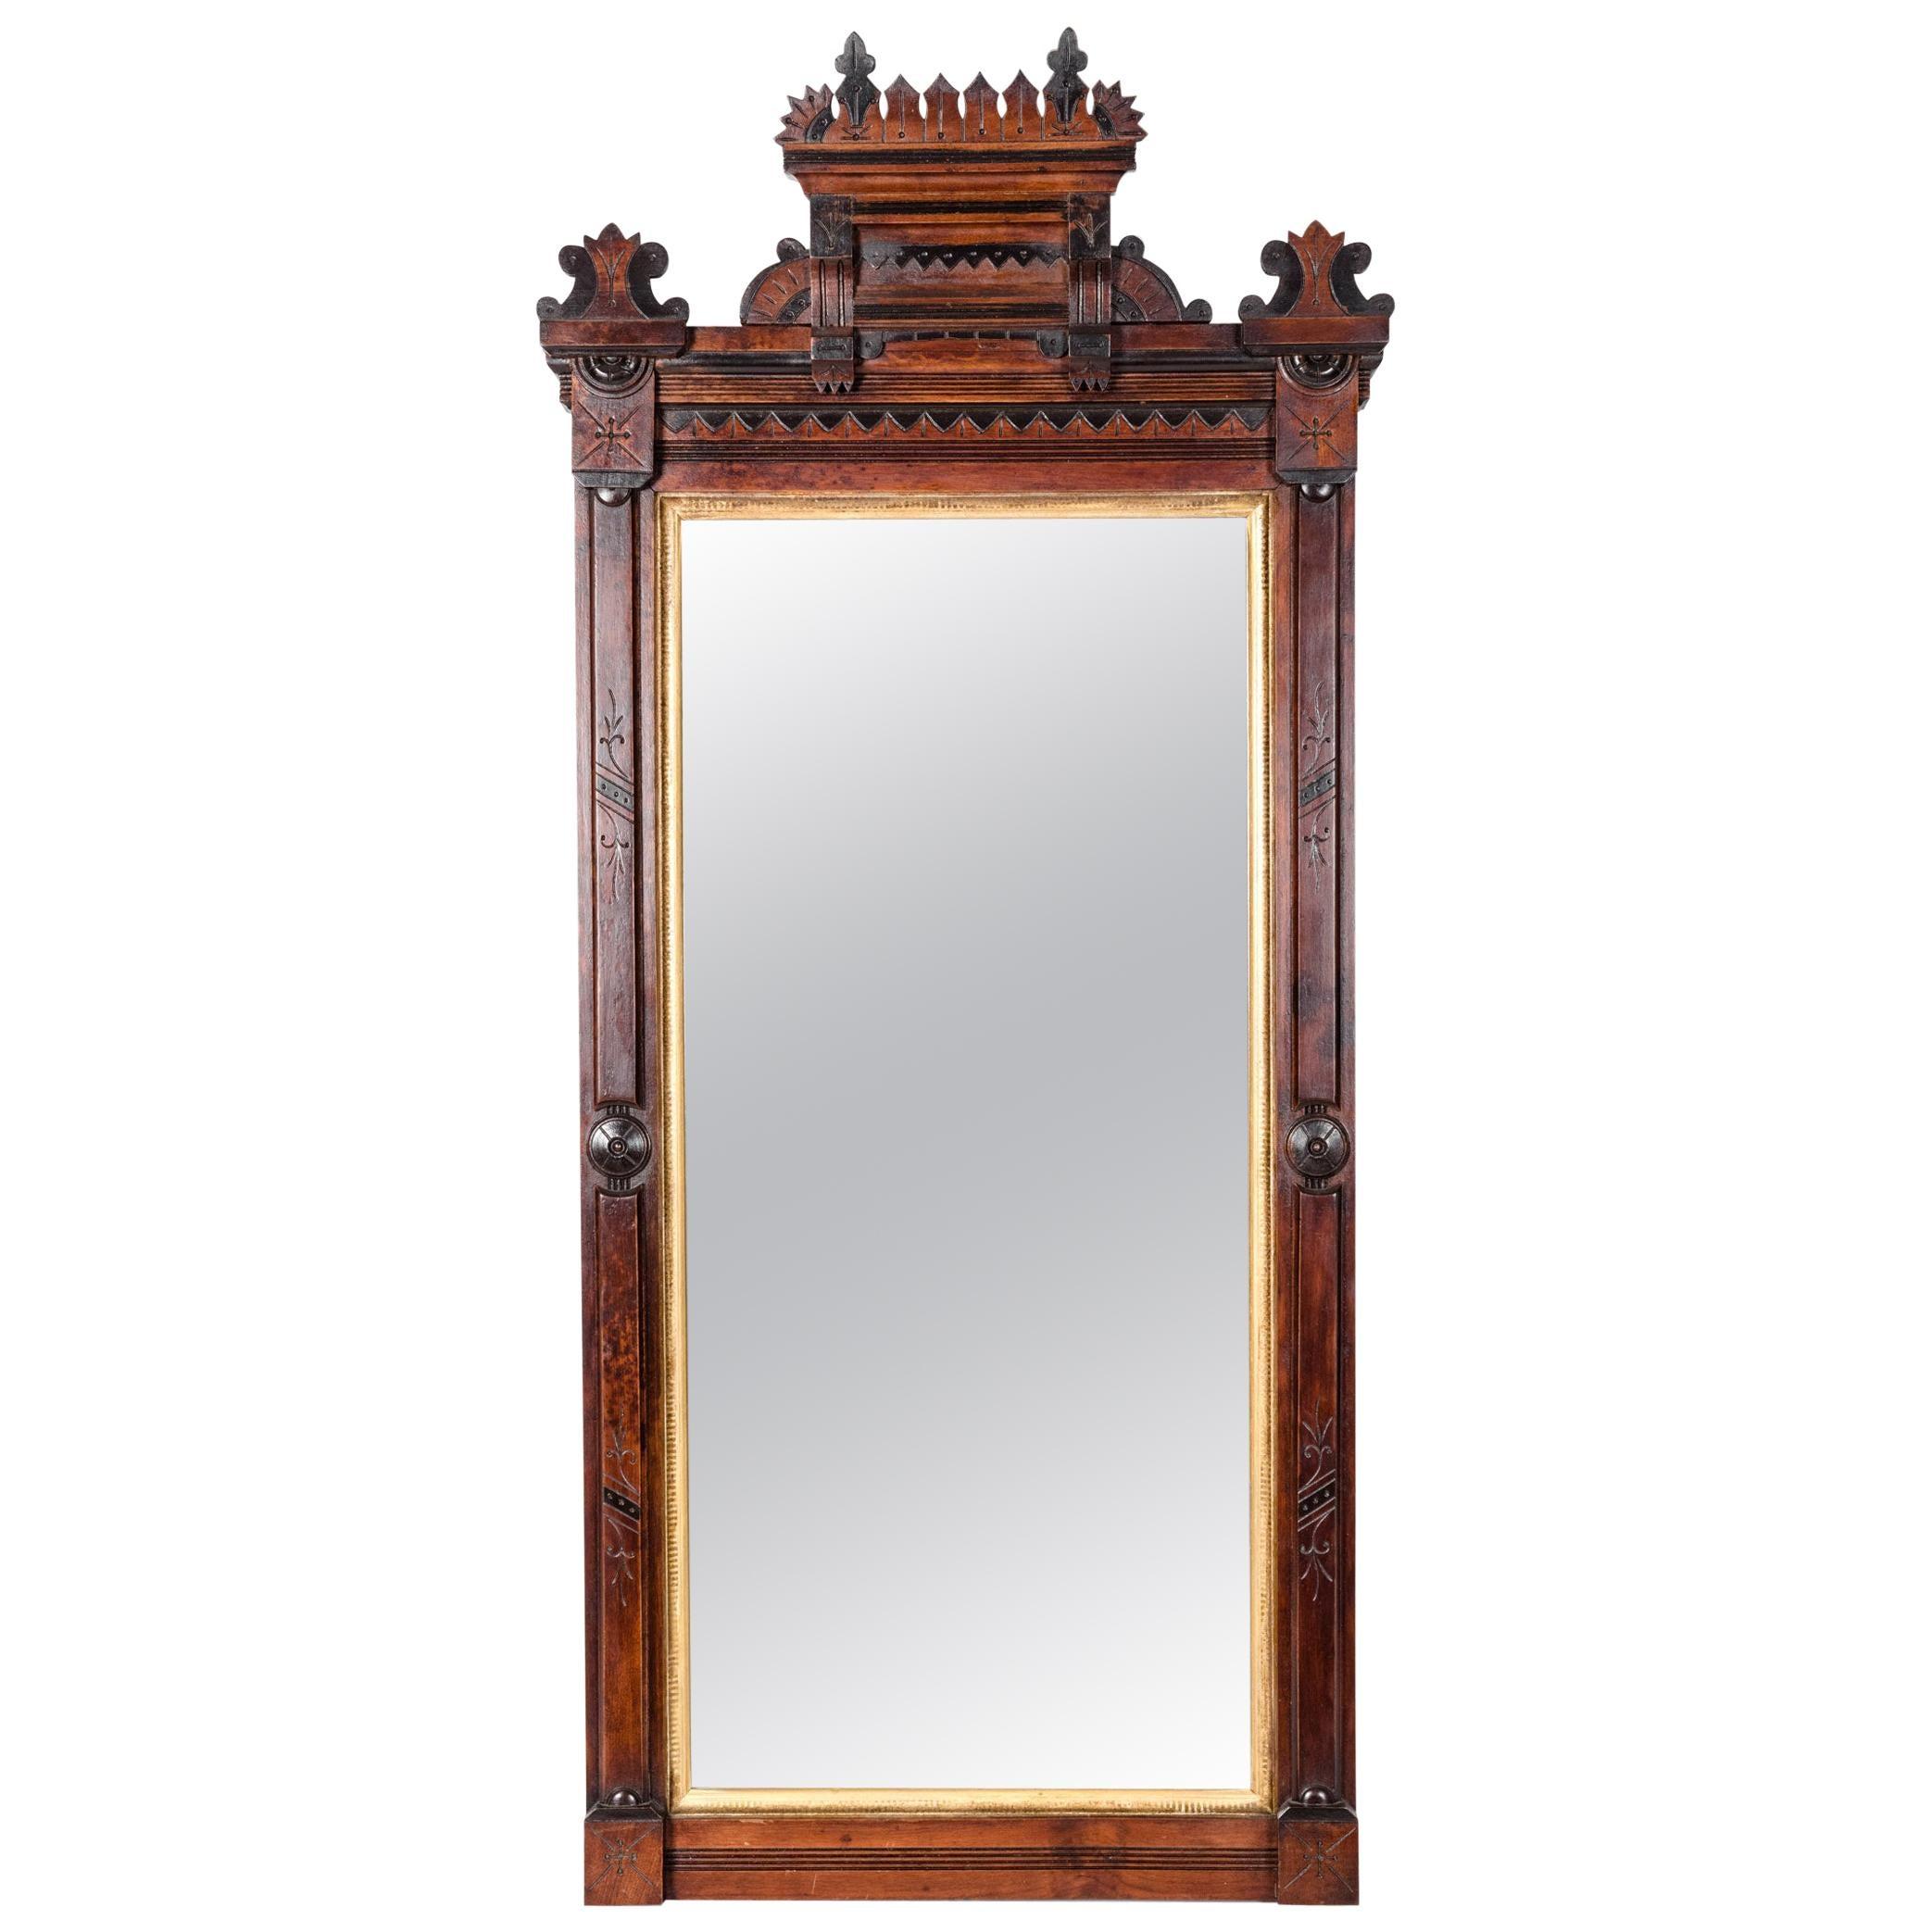 Highly Carved Mahogany Wood / Gold Leaf Framed Hanging Mirror